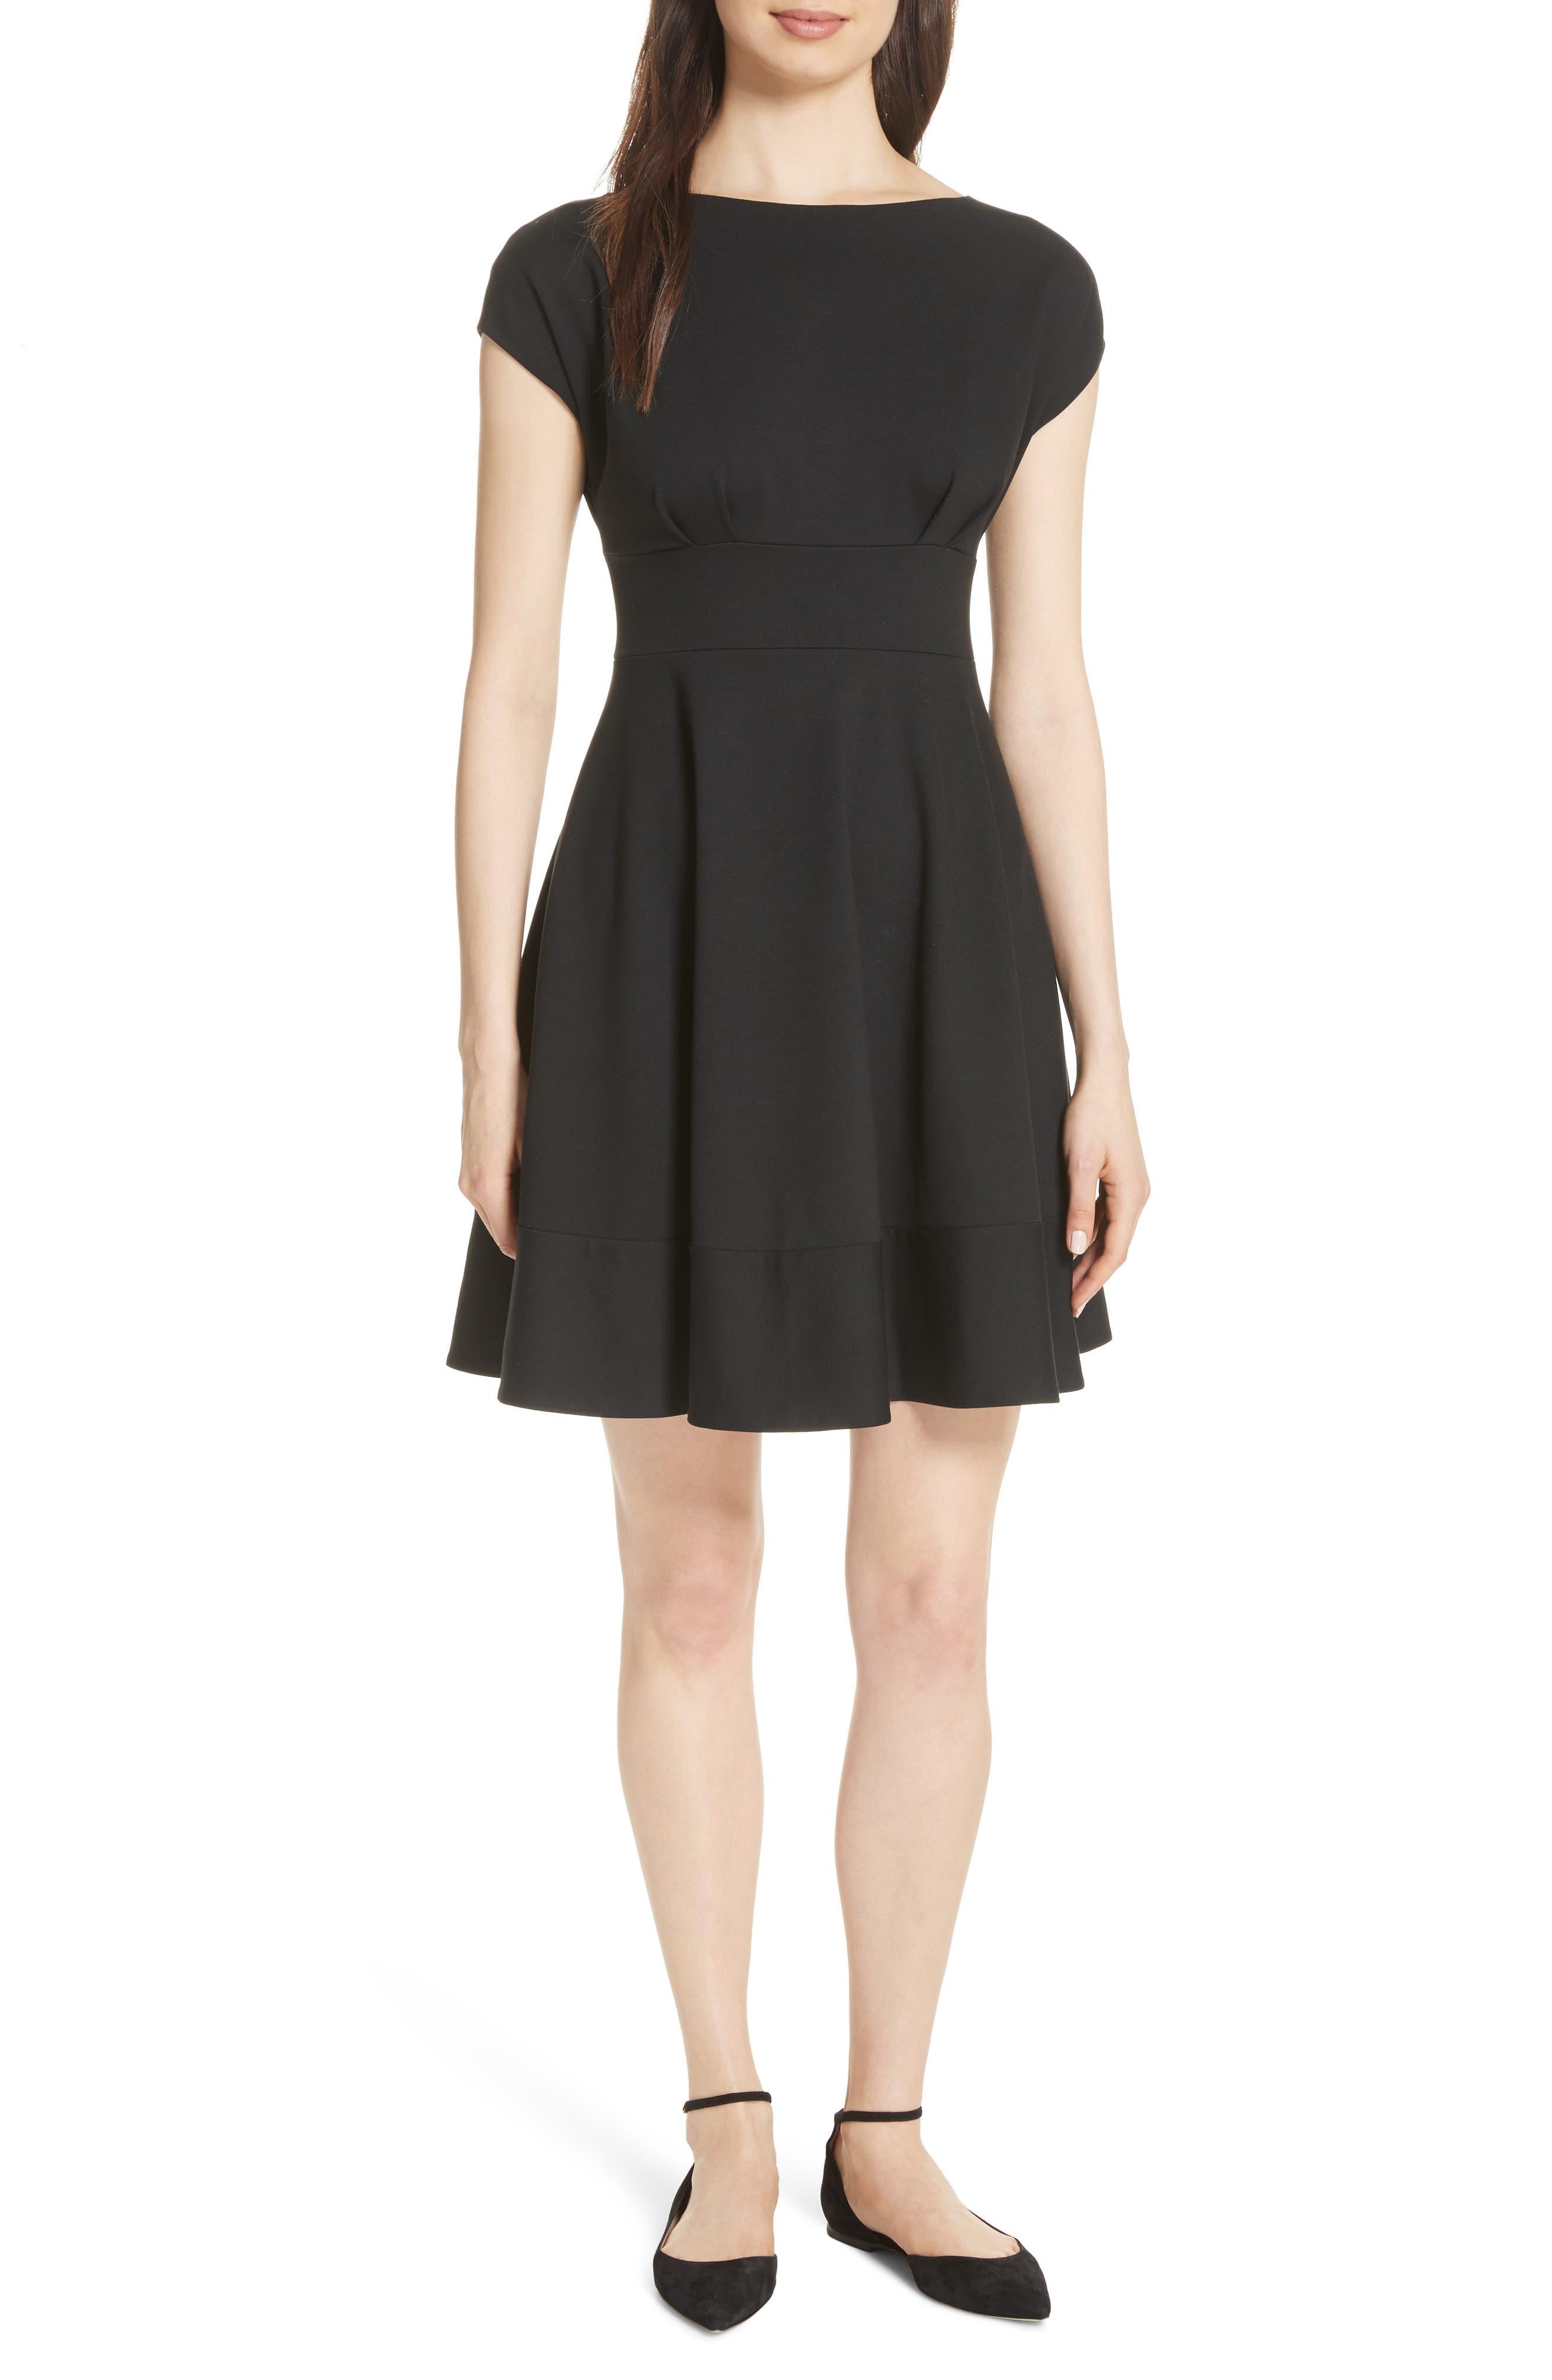 KATE SPADE NEW YORK ponte fiorella fit & flare dress, Main, color, BLACK